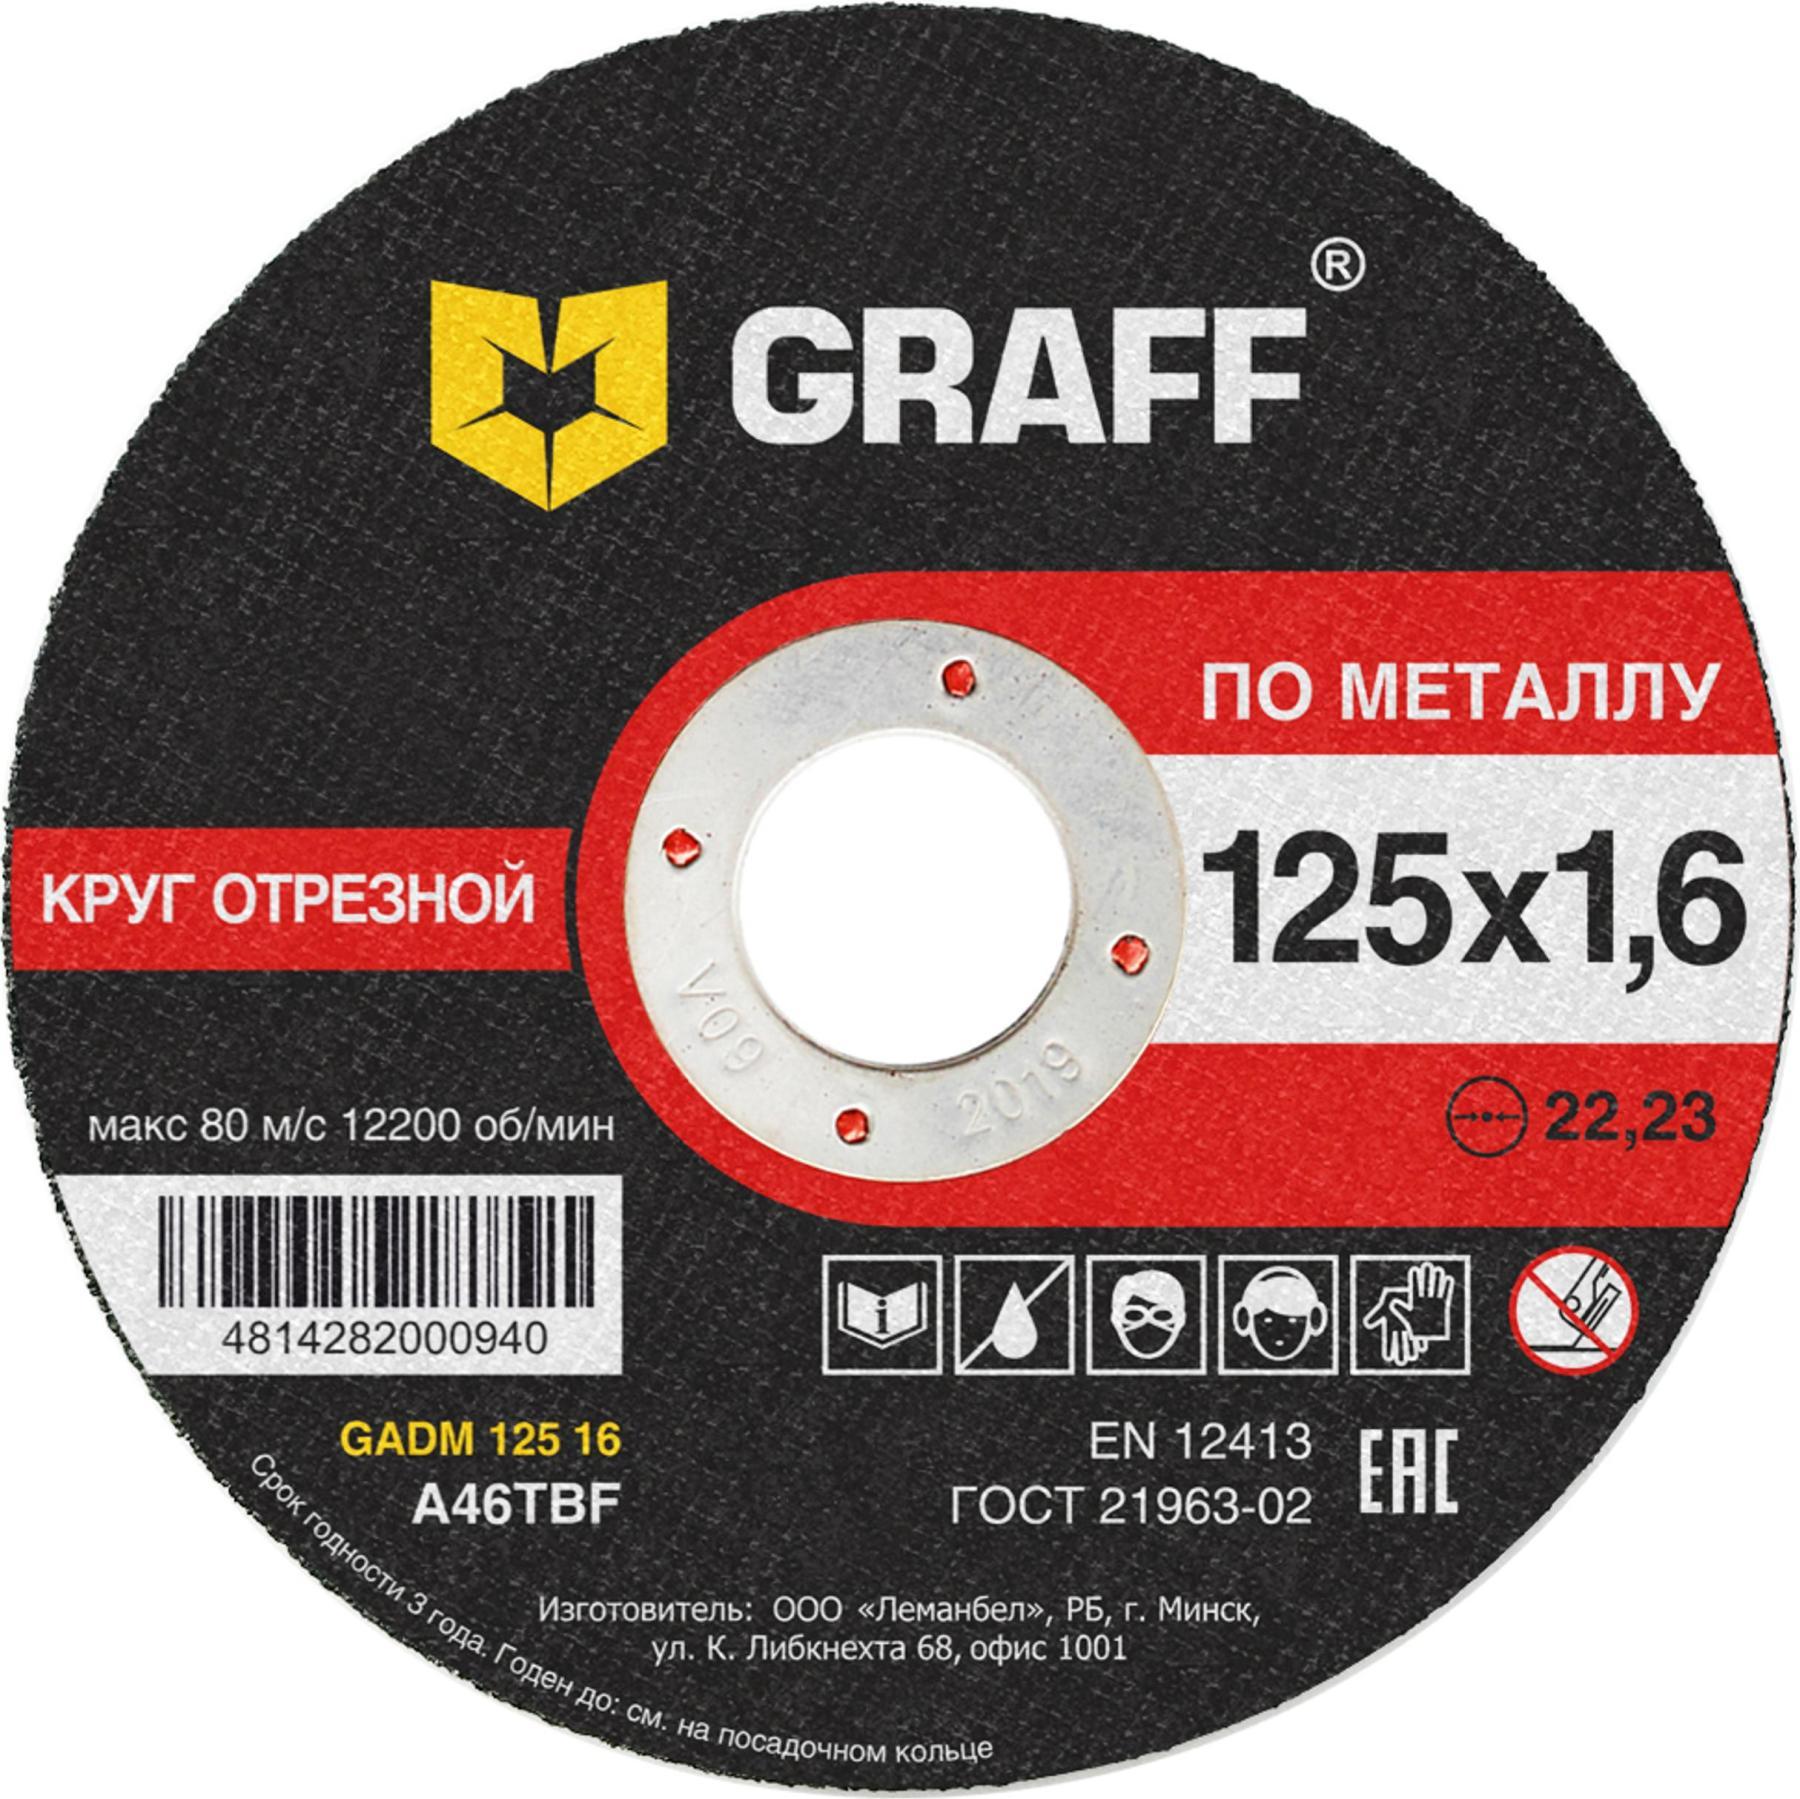 Circle Cutting GRAFF GADM 125 16